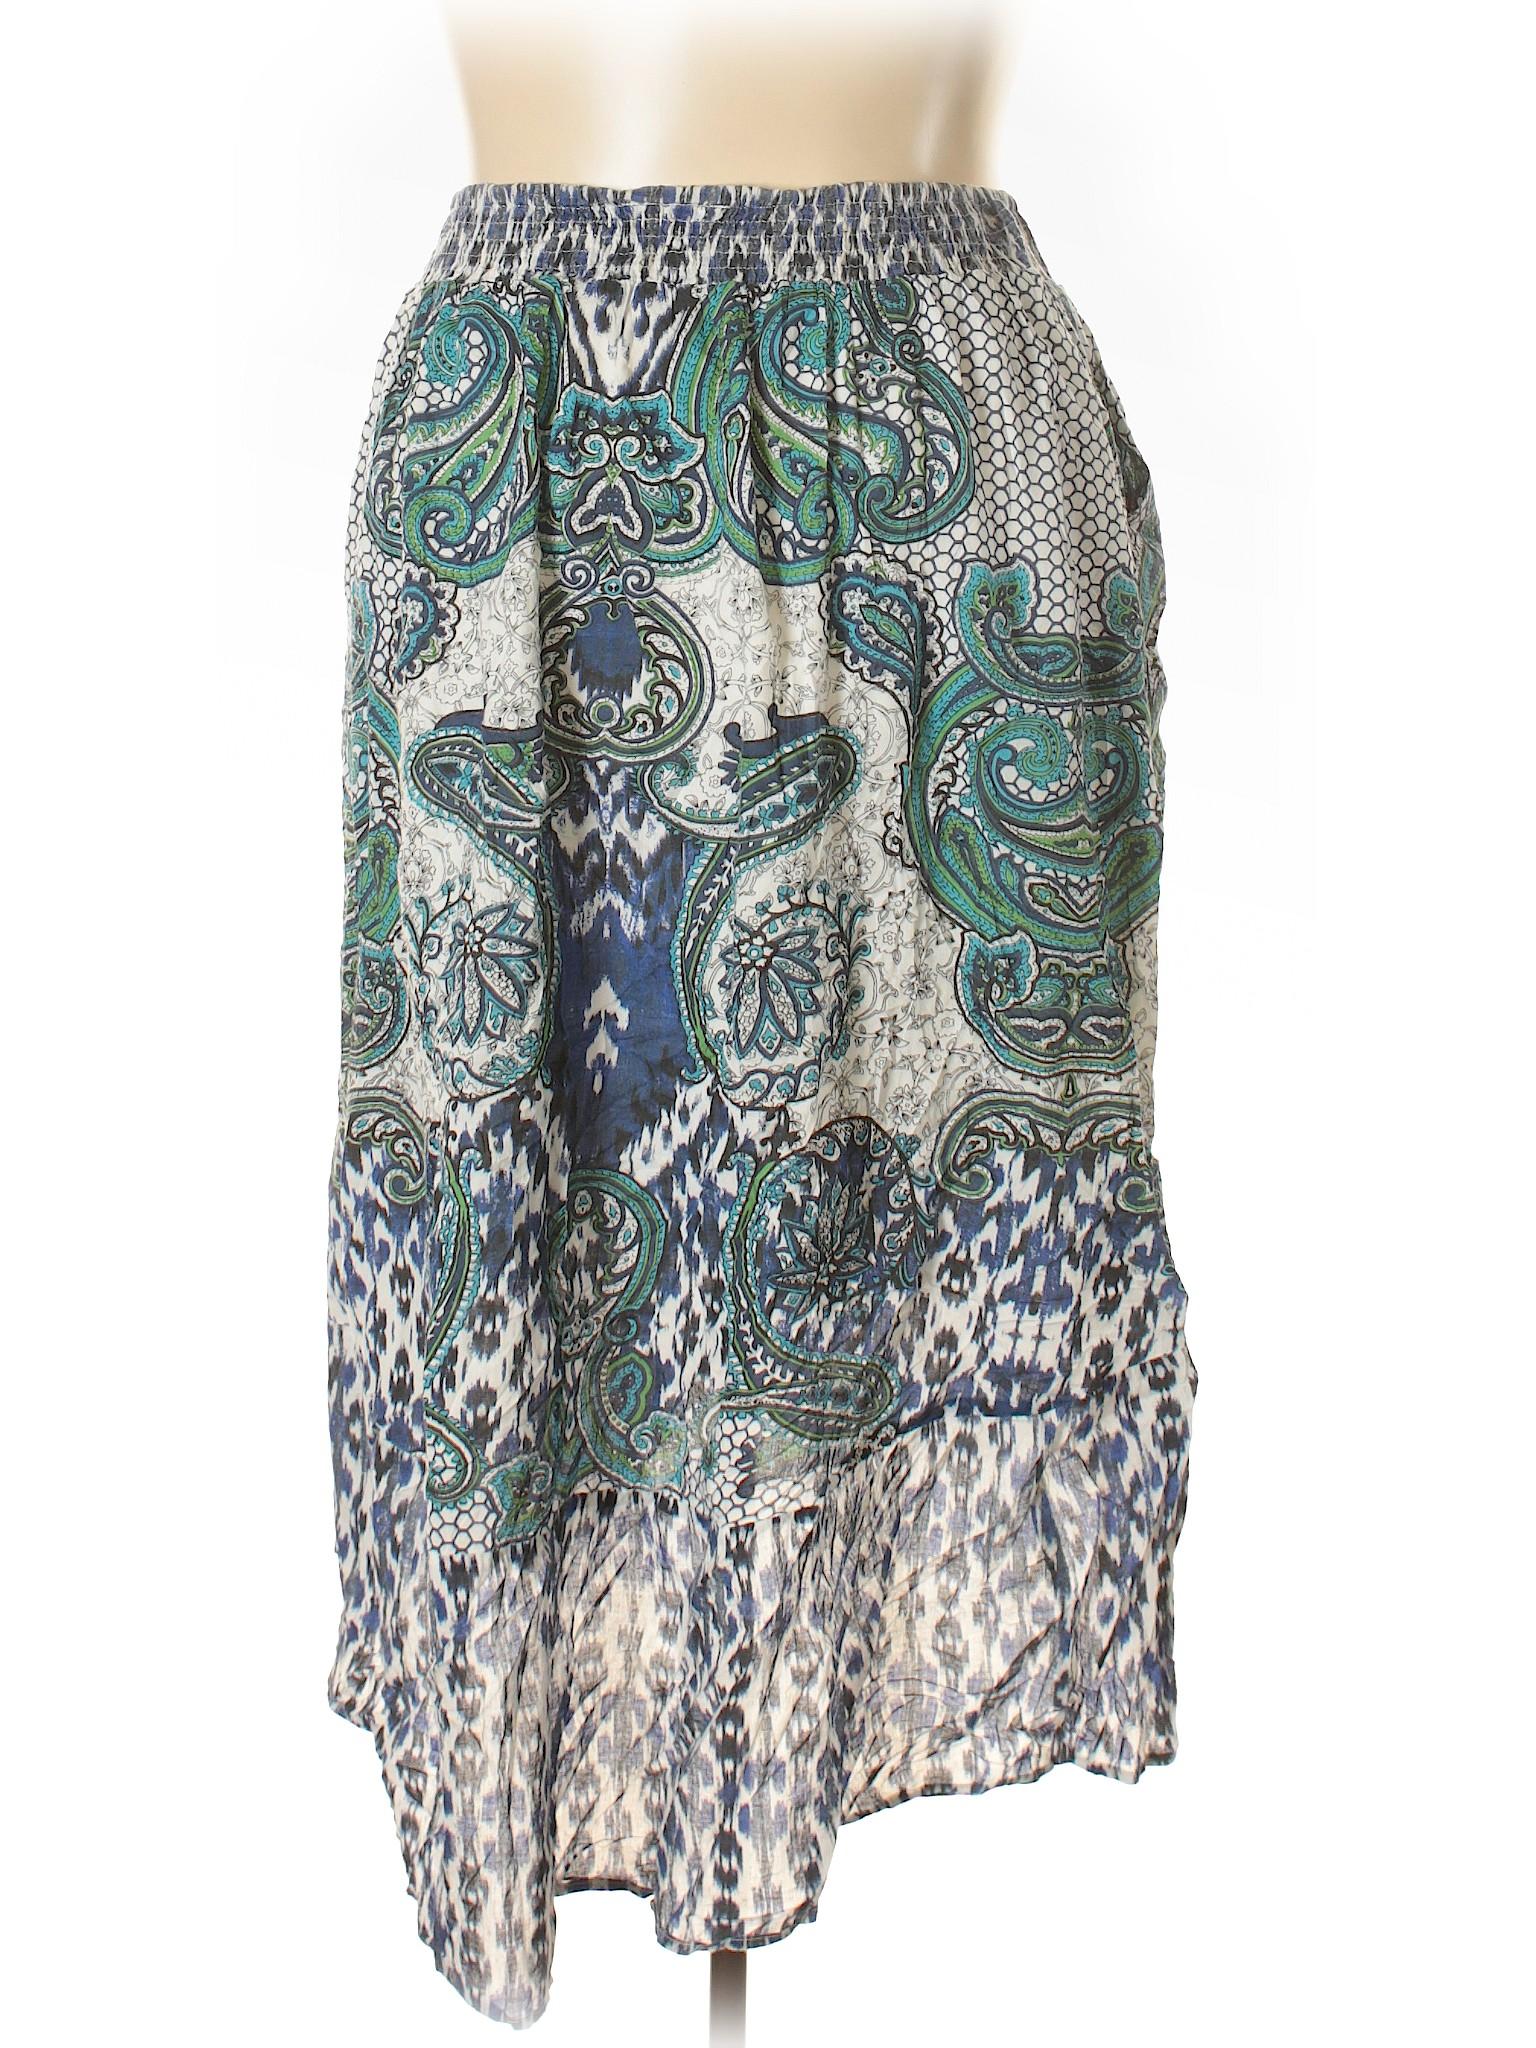 Cato Boutique Casual Skirt Casual Boutique leisure Skirt Cato leisure Boutique leisure c5q88X1O